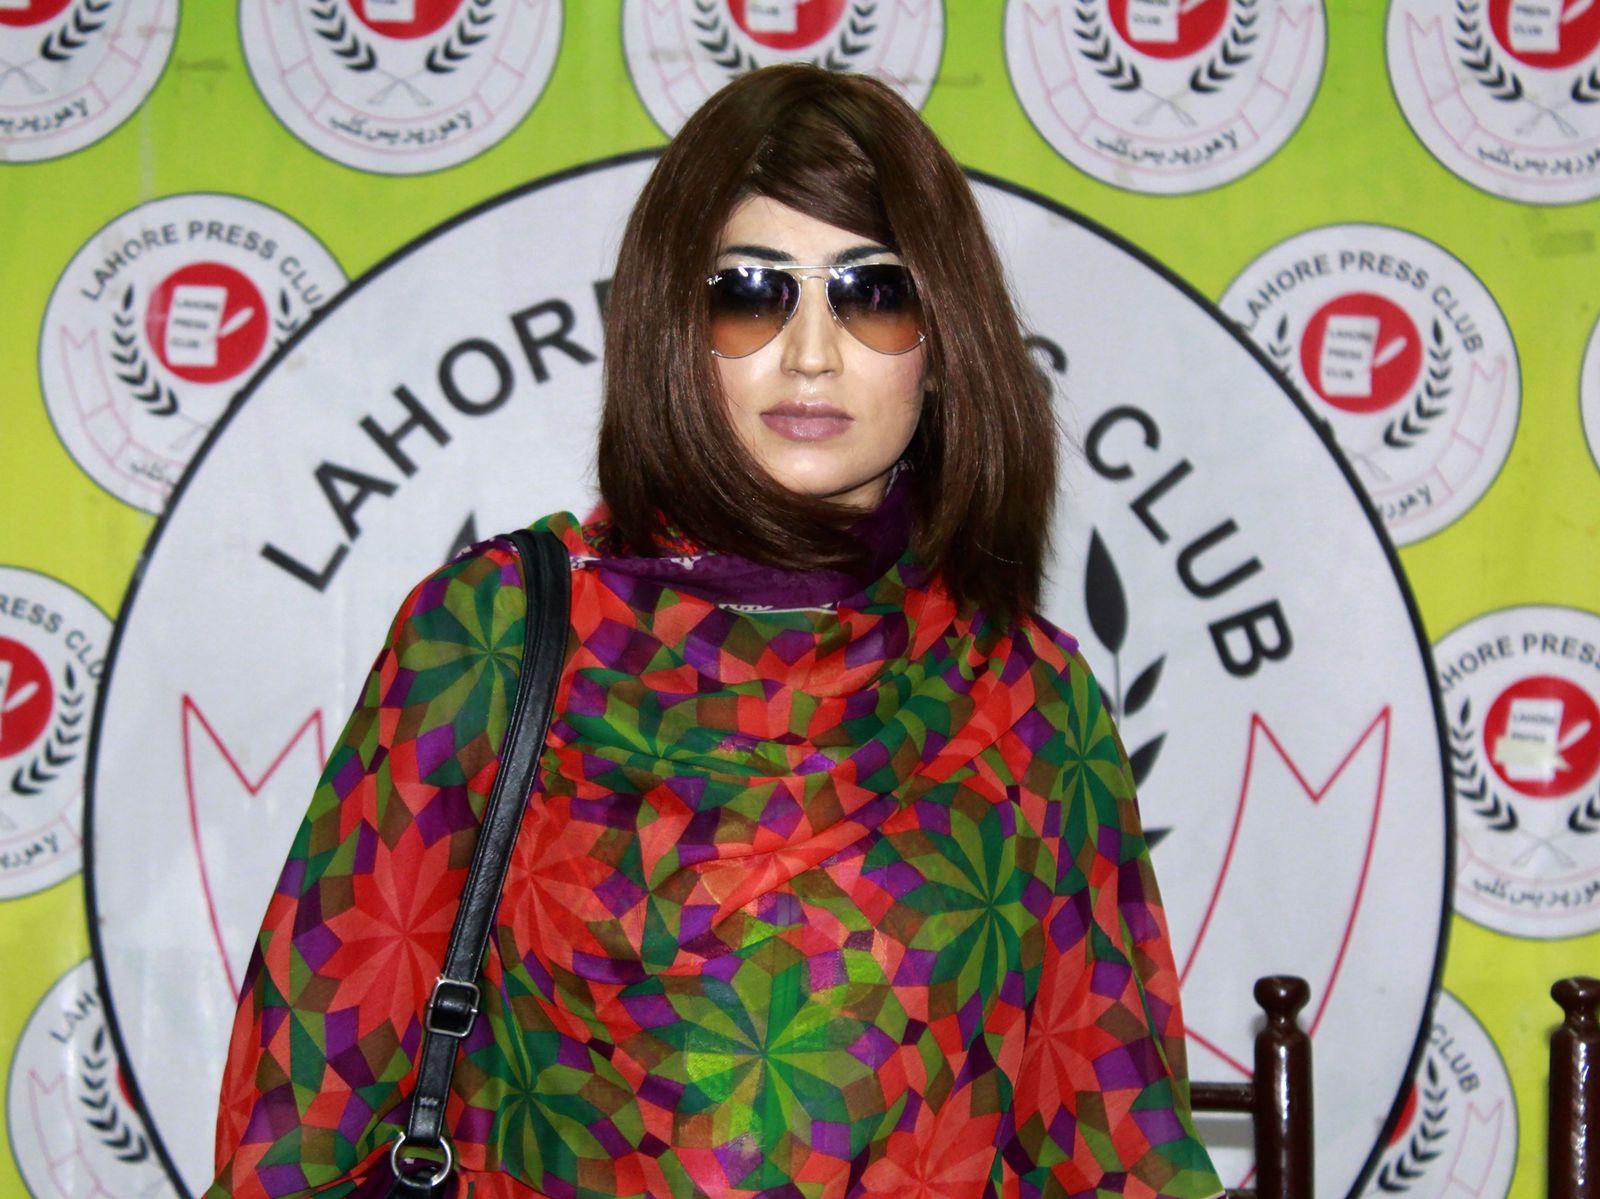 Pakistan Qandeel Baloch